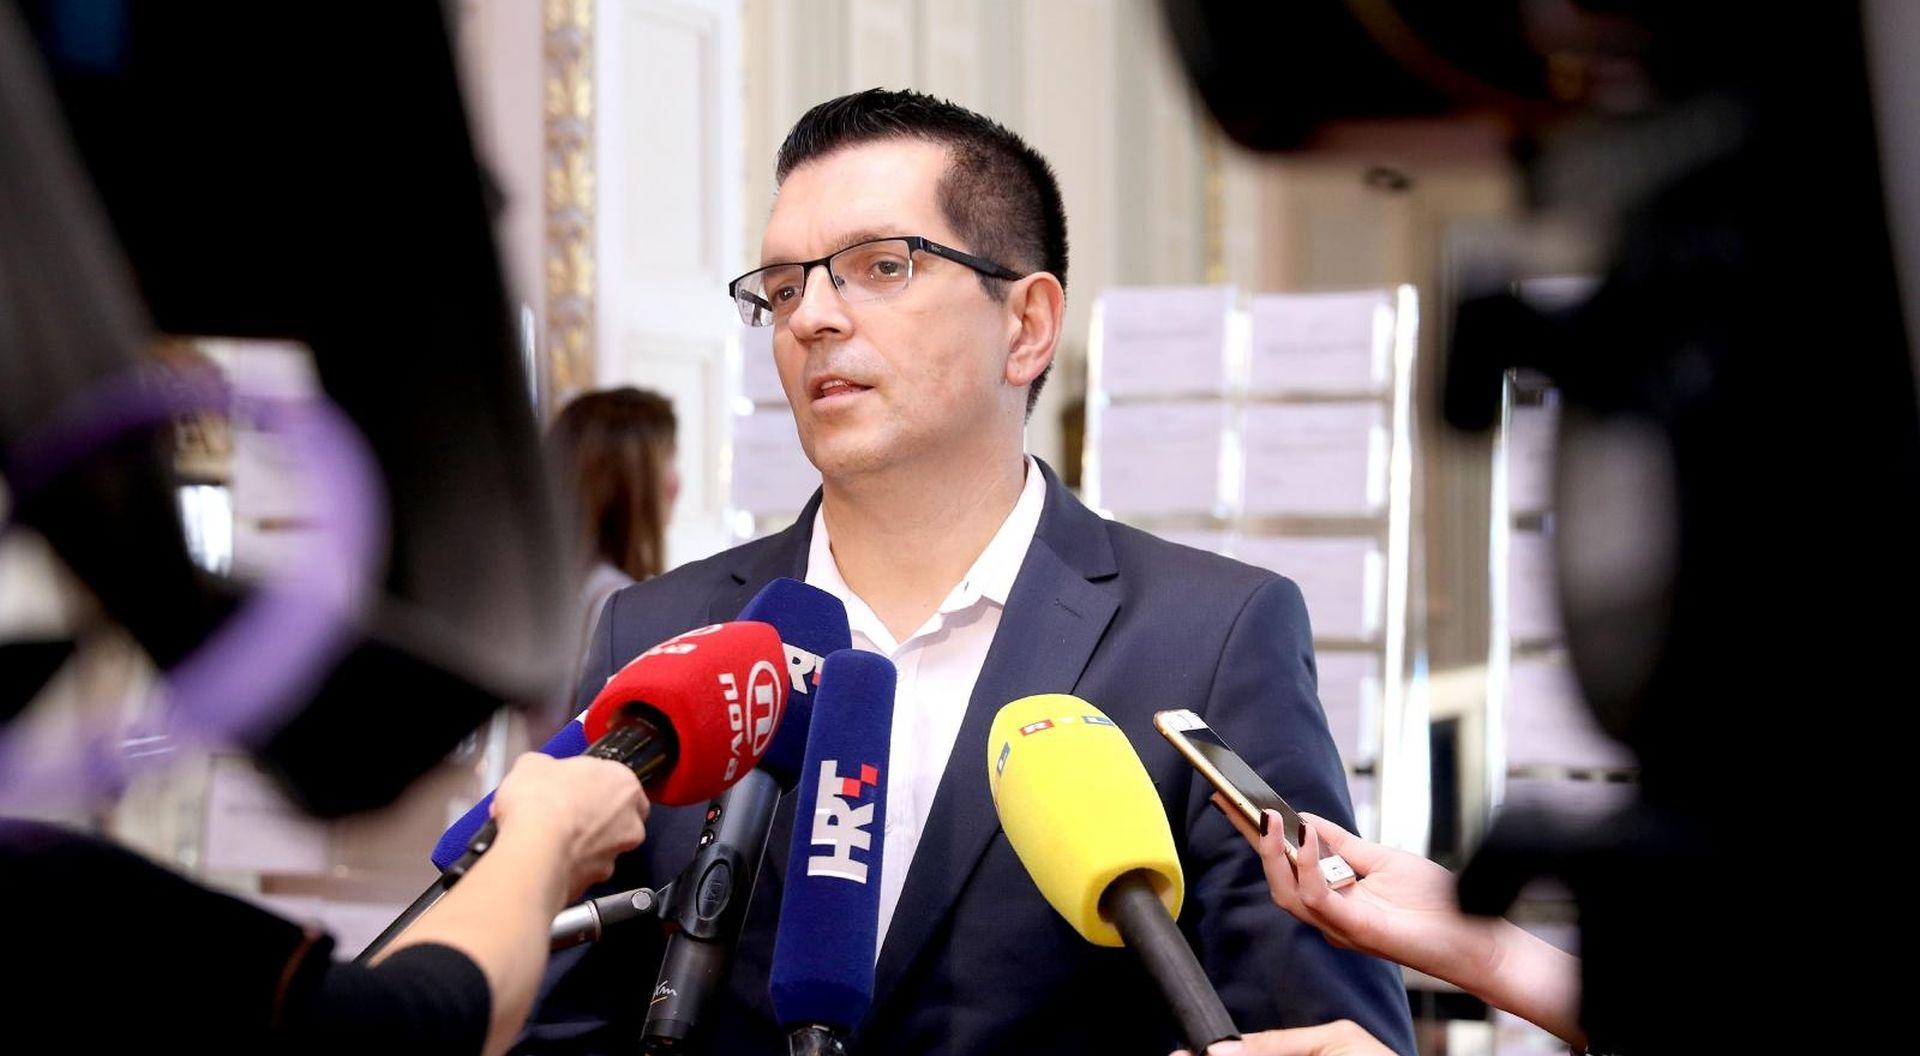 Bunjac prozvao Sabor, Plenkovića i HDZ, Bačić mu uzvratio